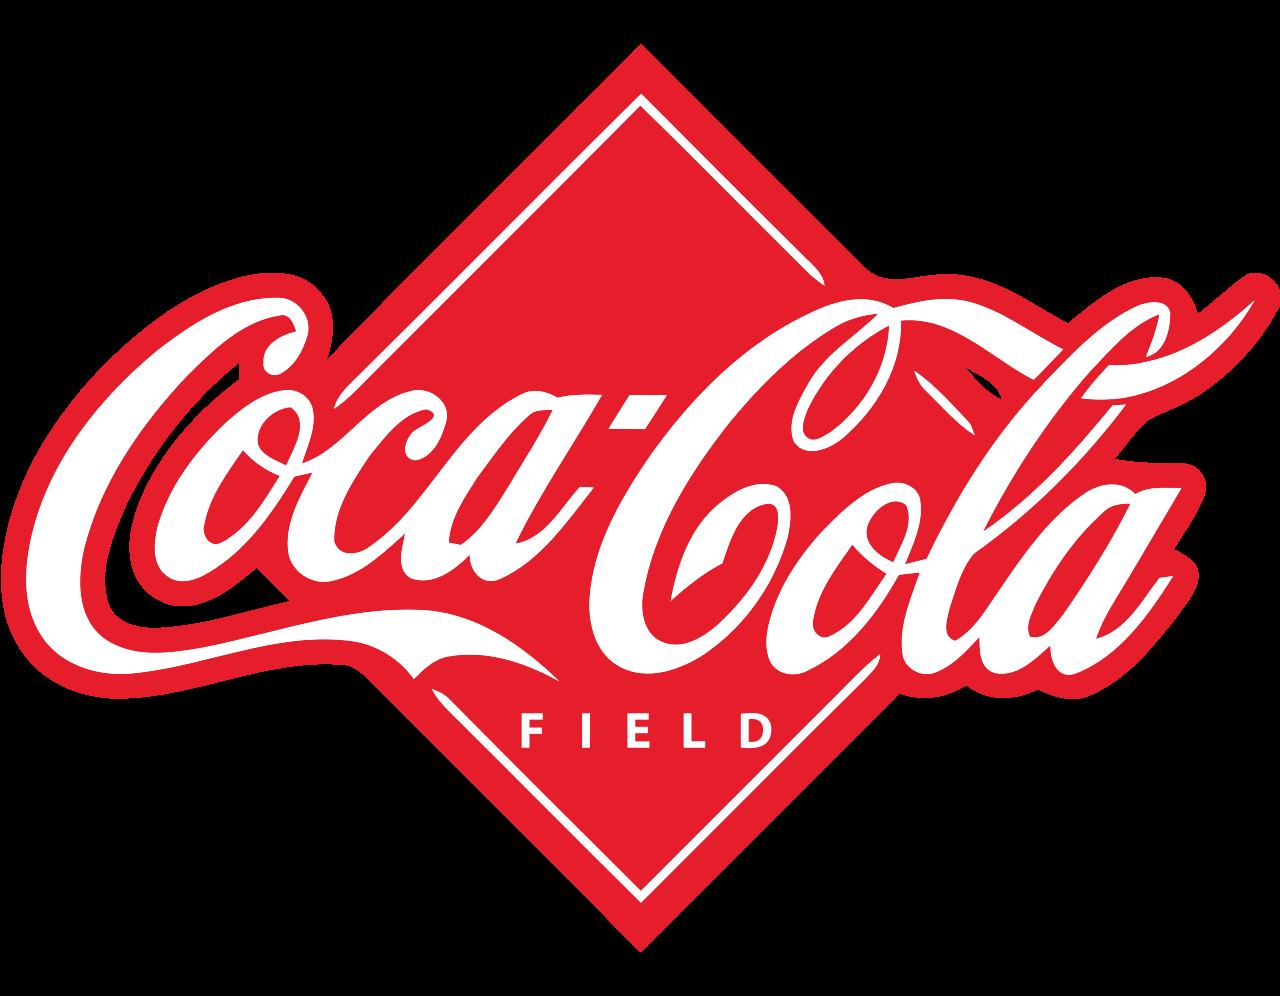 Coca Cola logo PNG images free download.